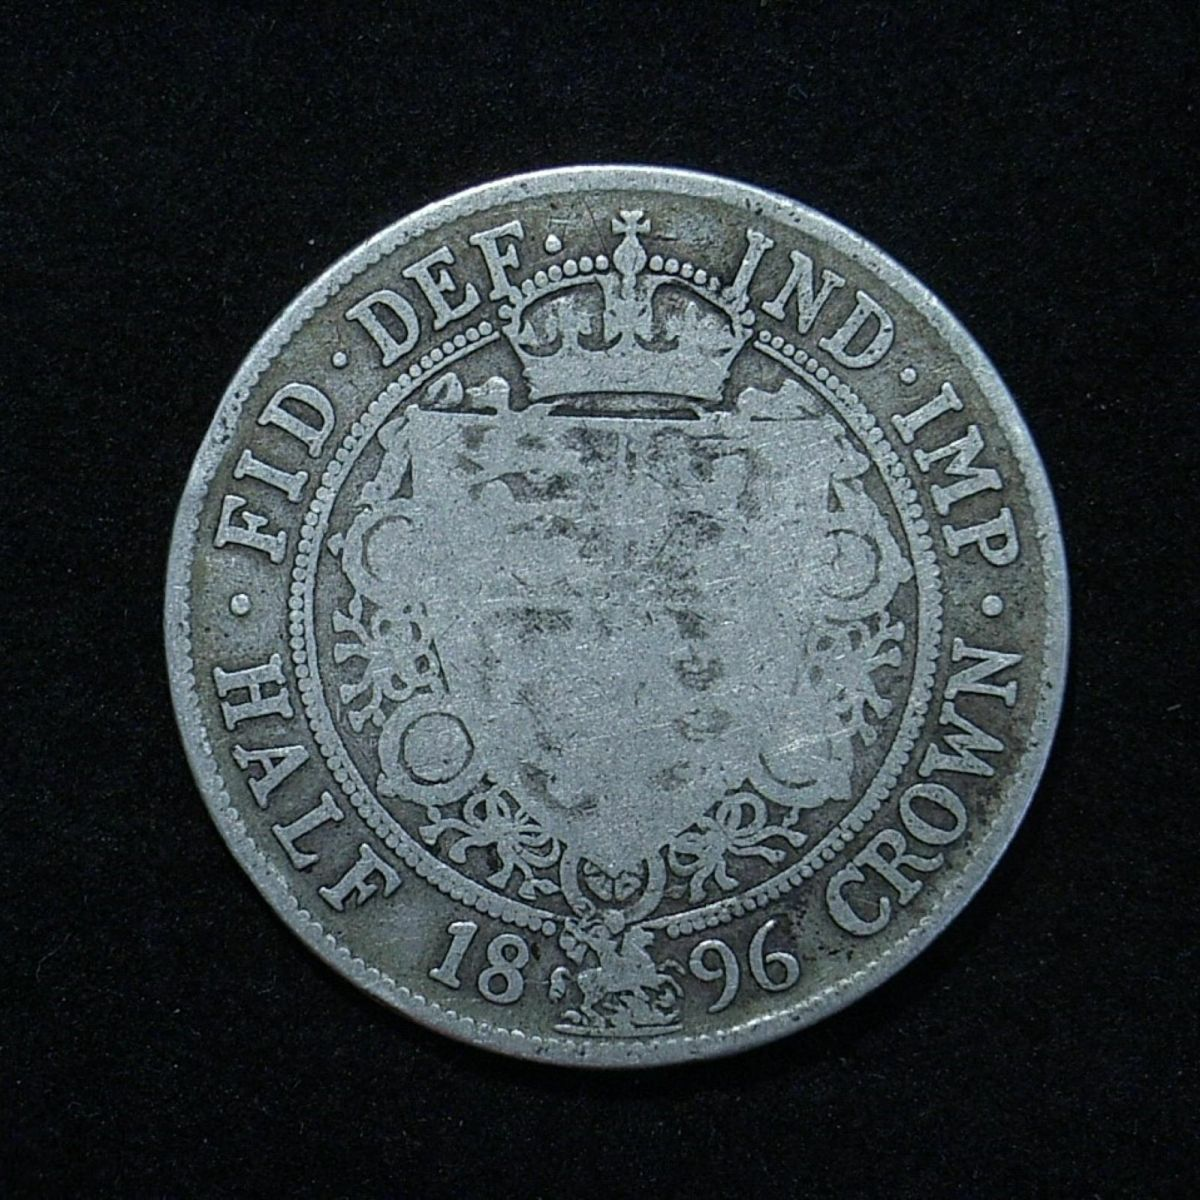 UK 1896 Half Crown reverse close up